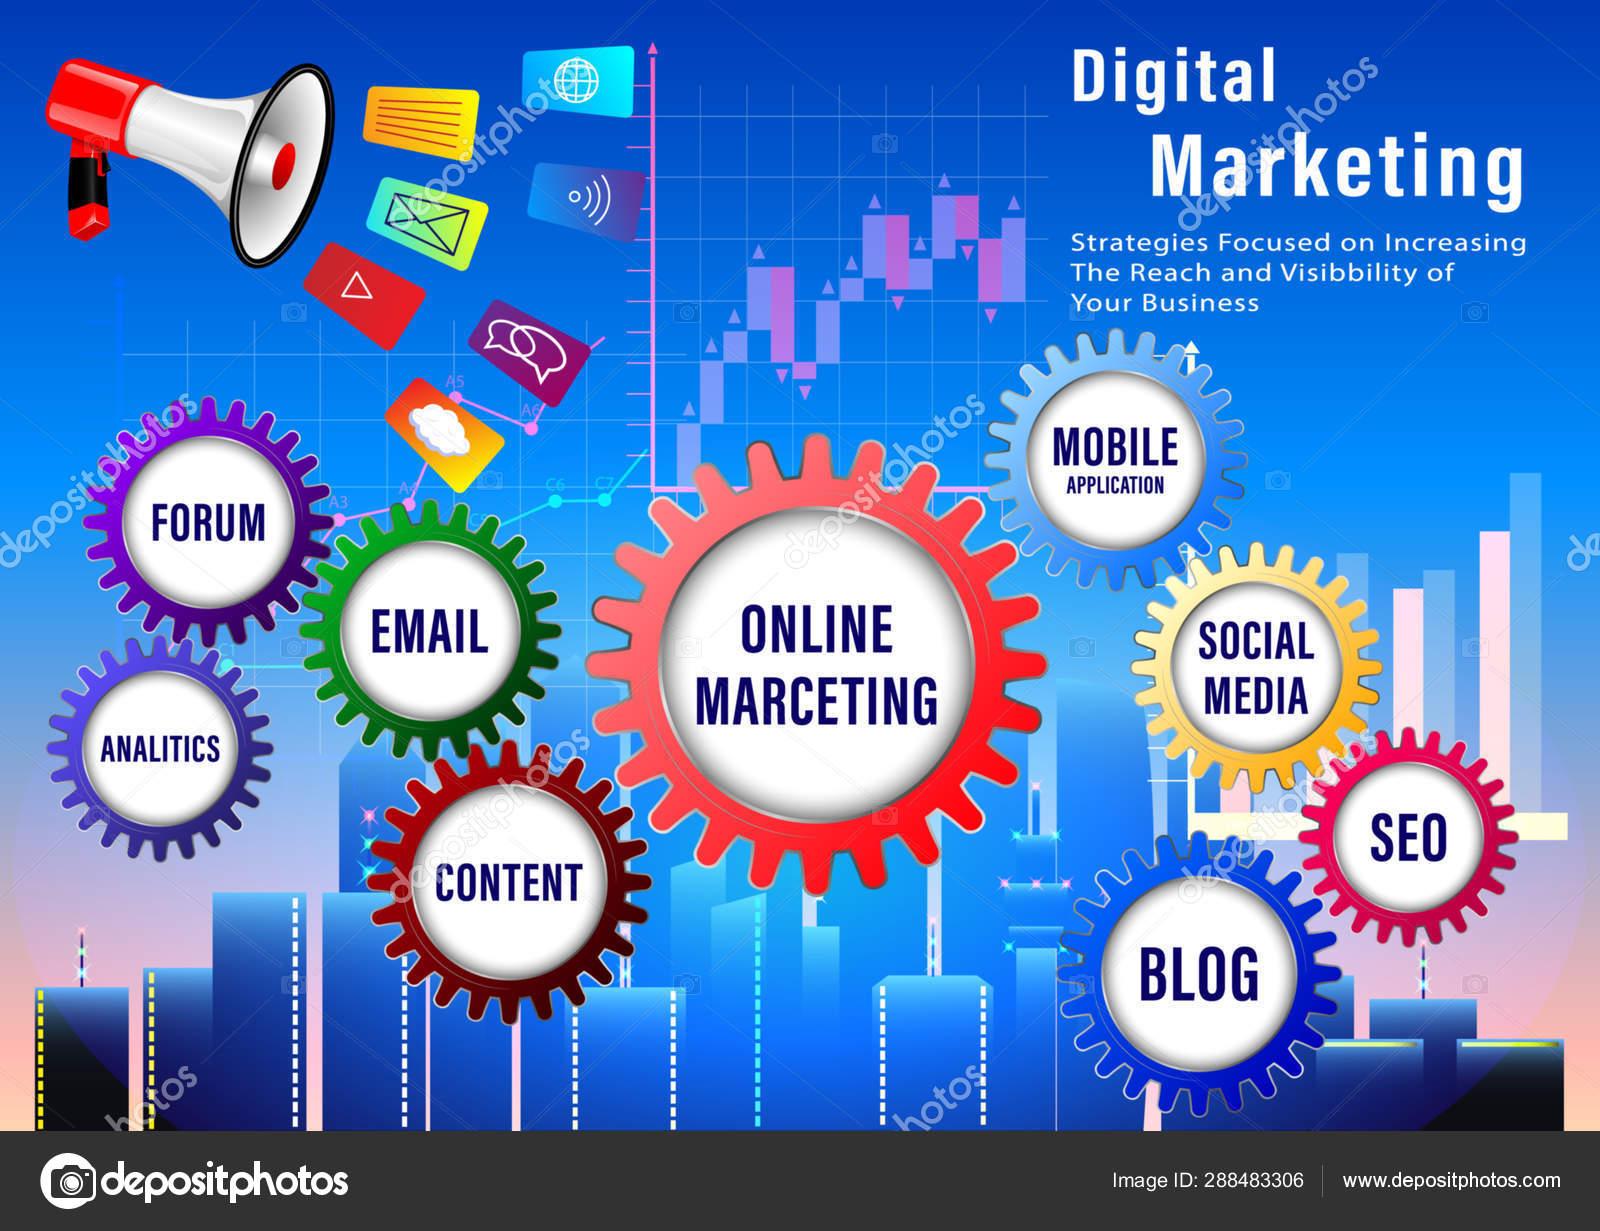 should you hire a digital marketing company